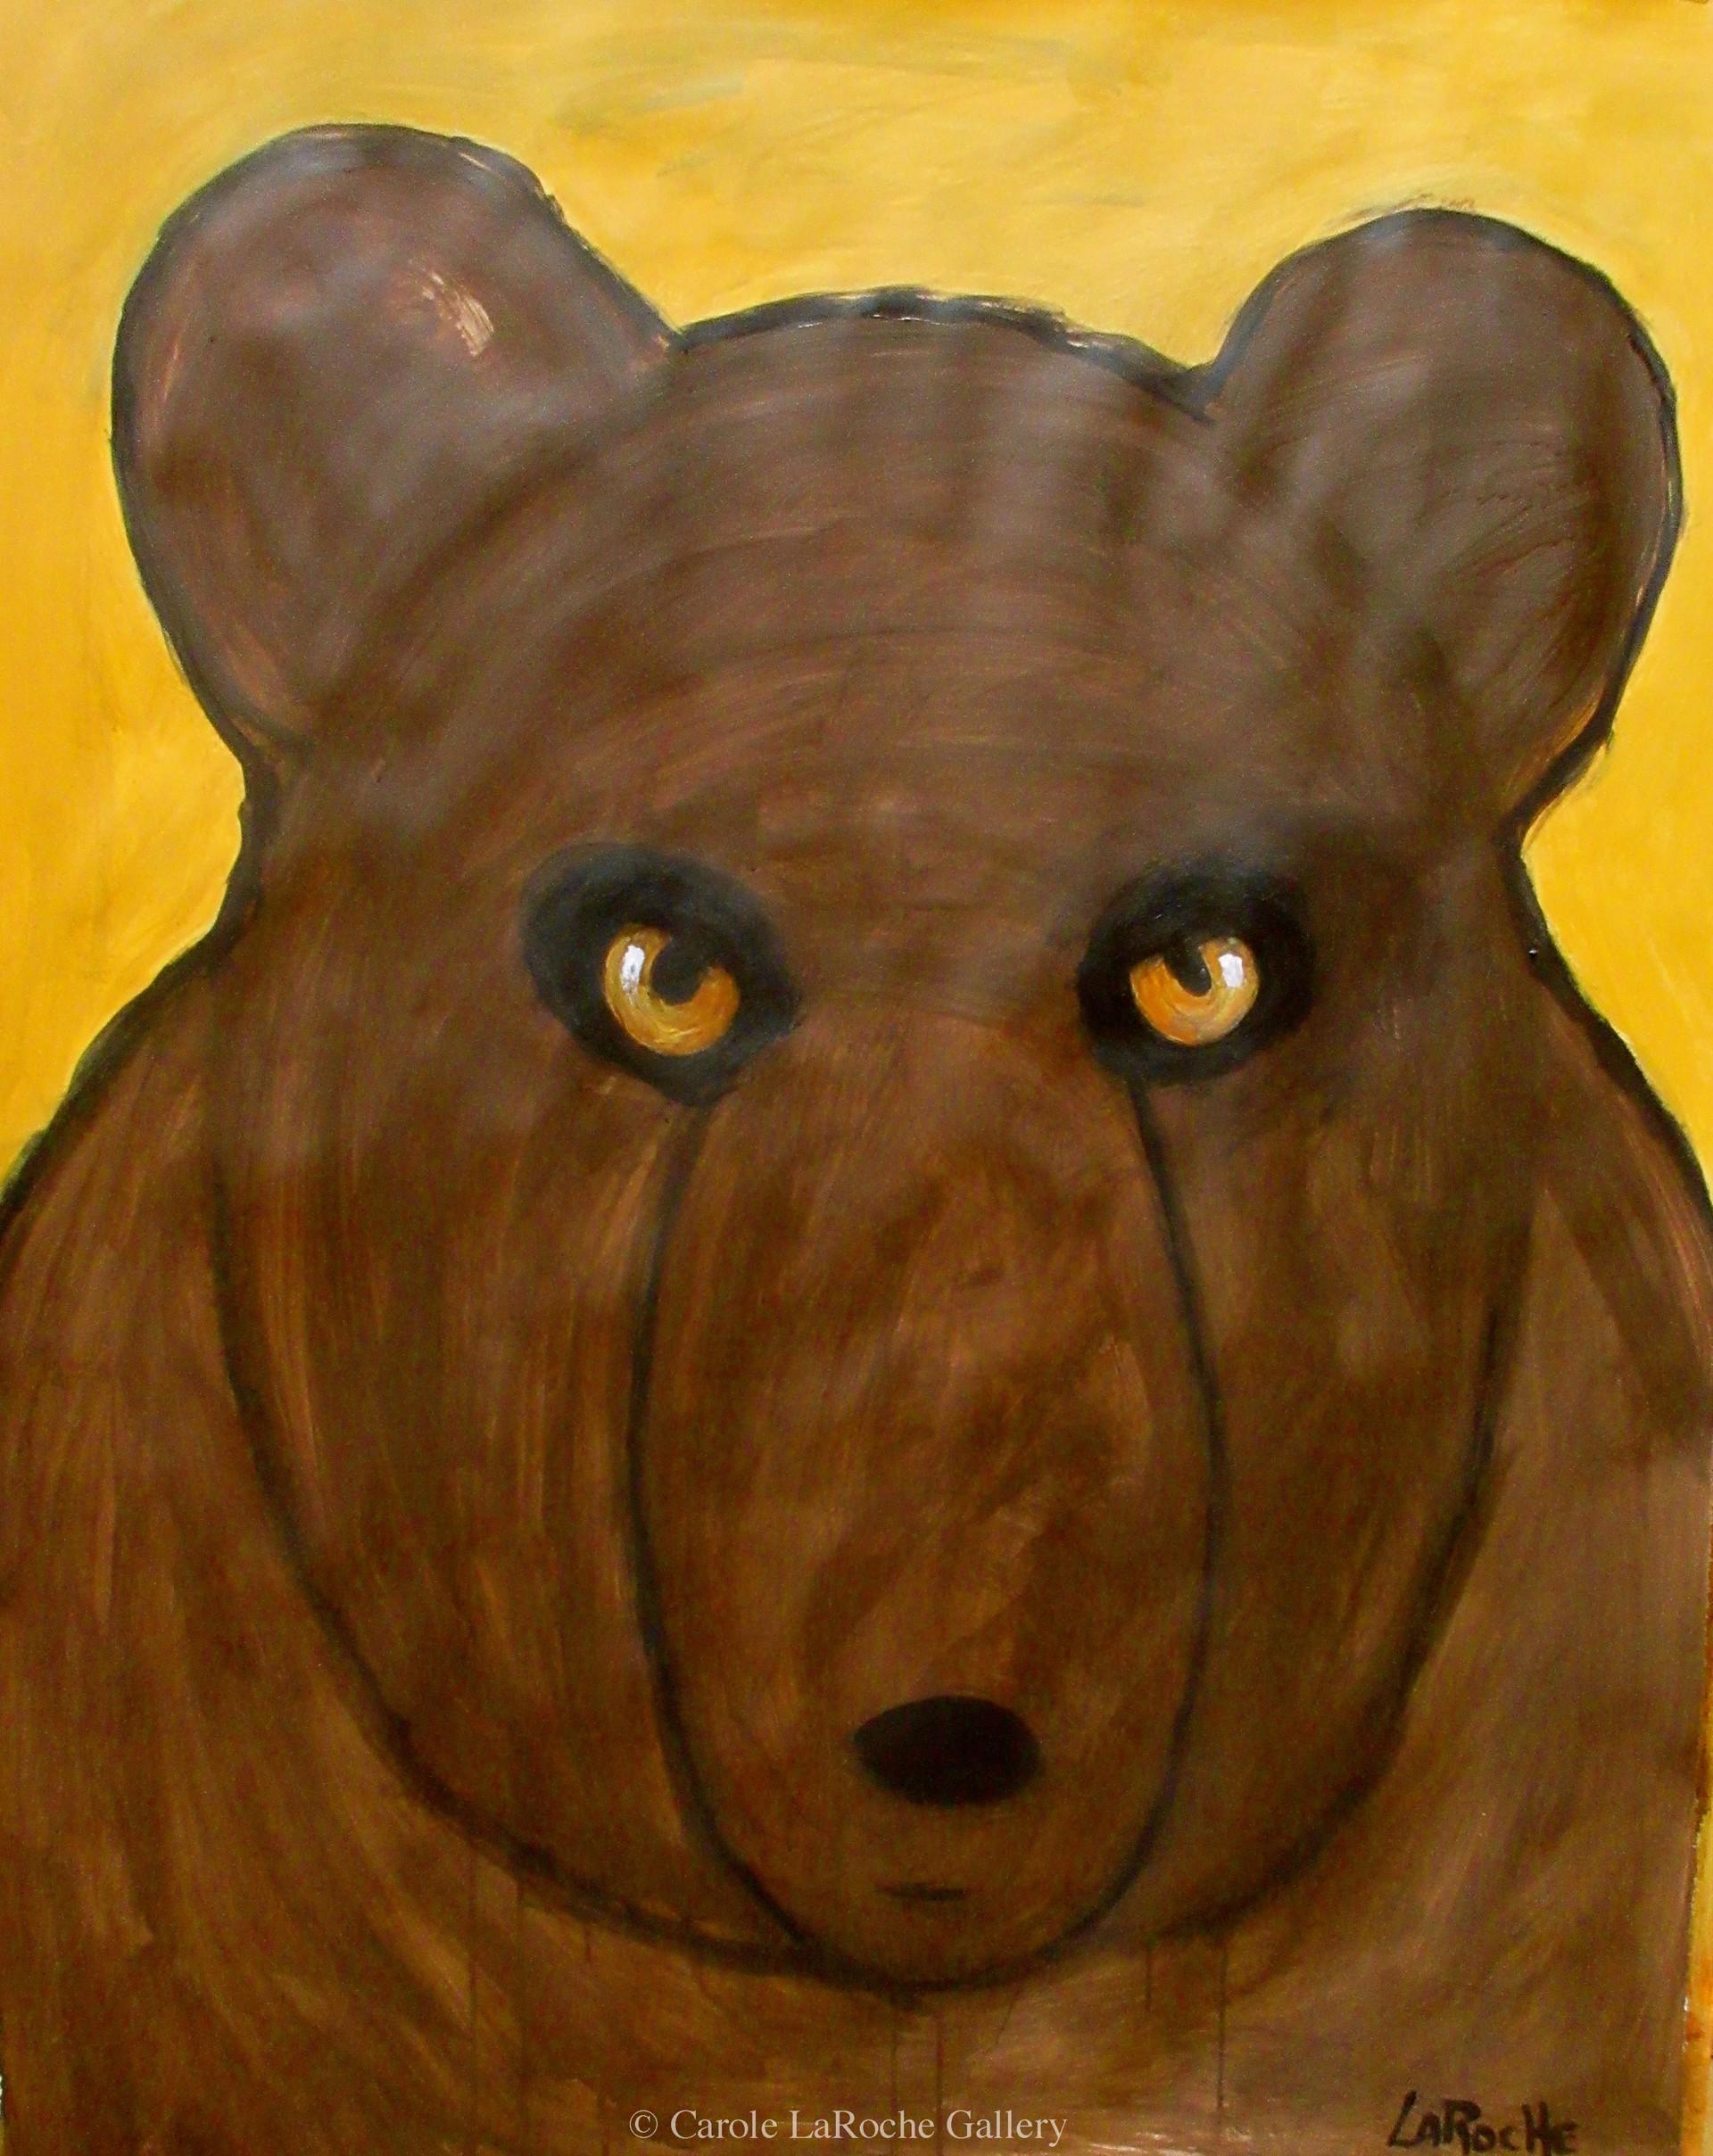 BIG BROWN BEAR by Carole LaRoche